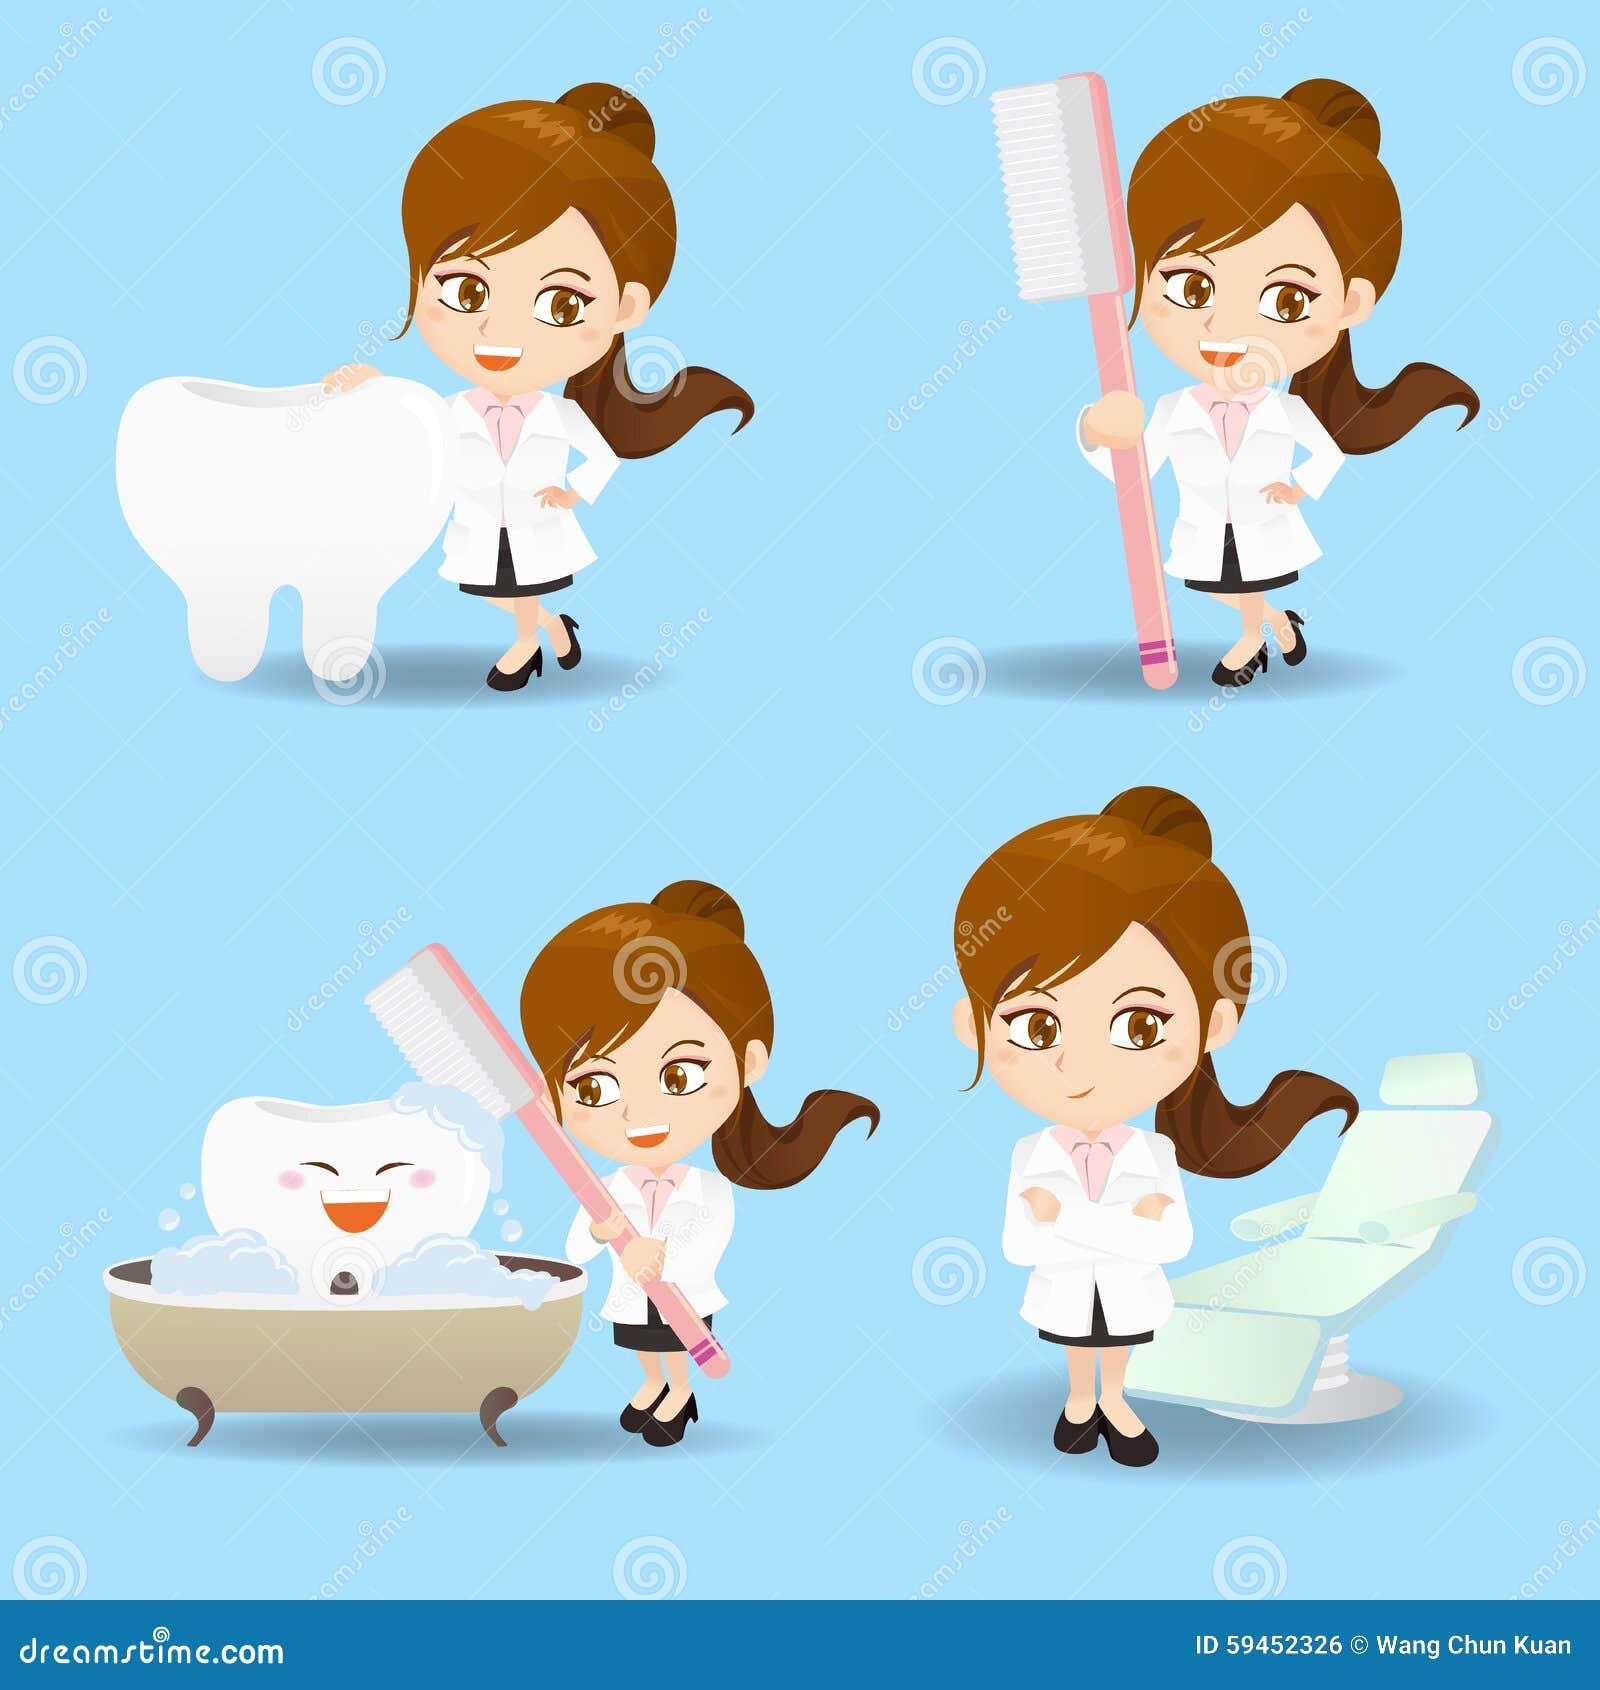 Cartoon Doctor Dentist Woman Stock Vector - Image: 59452326